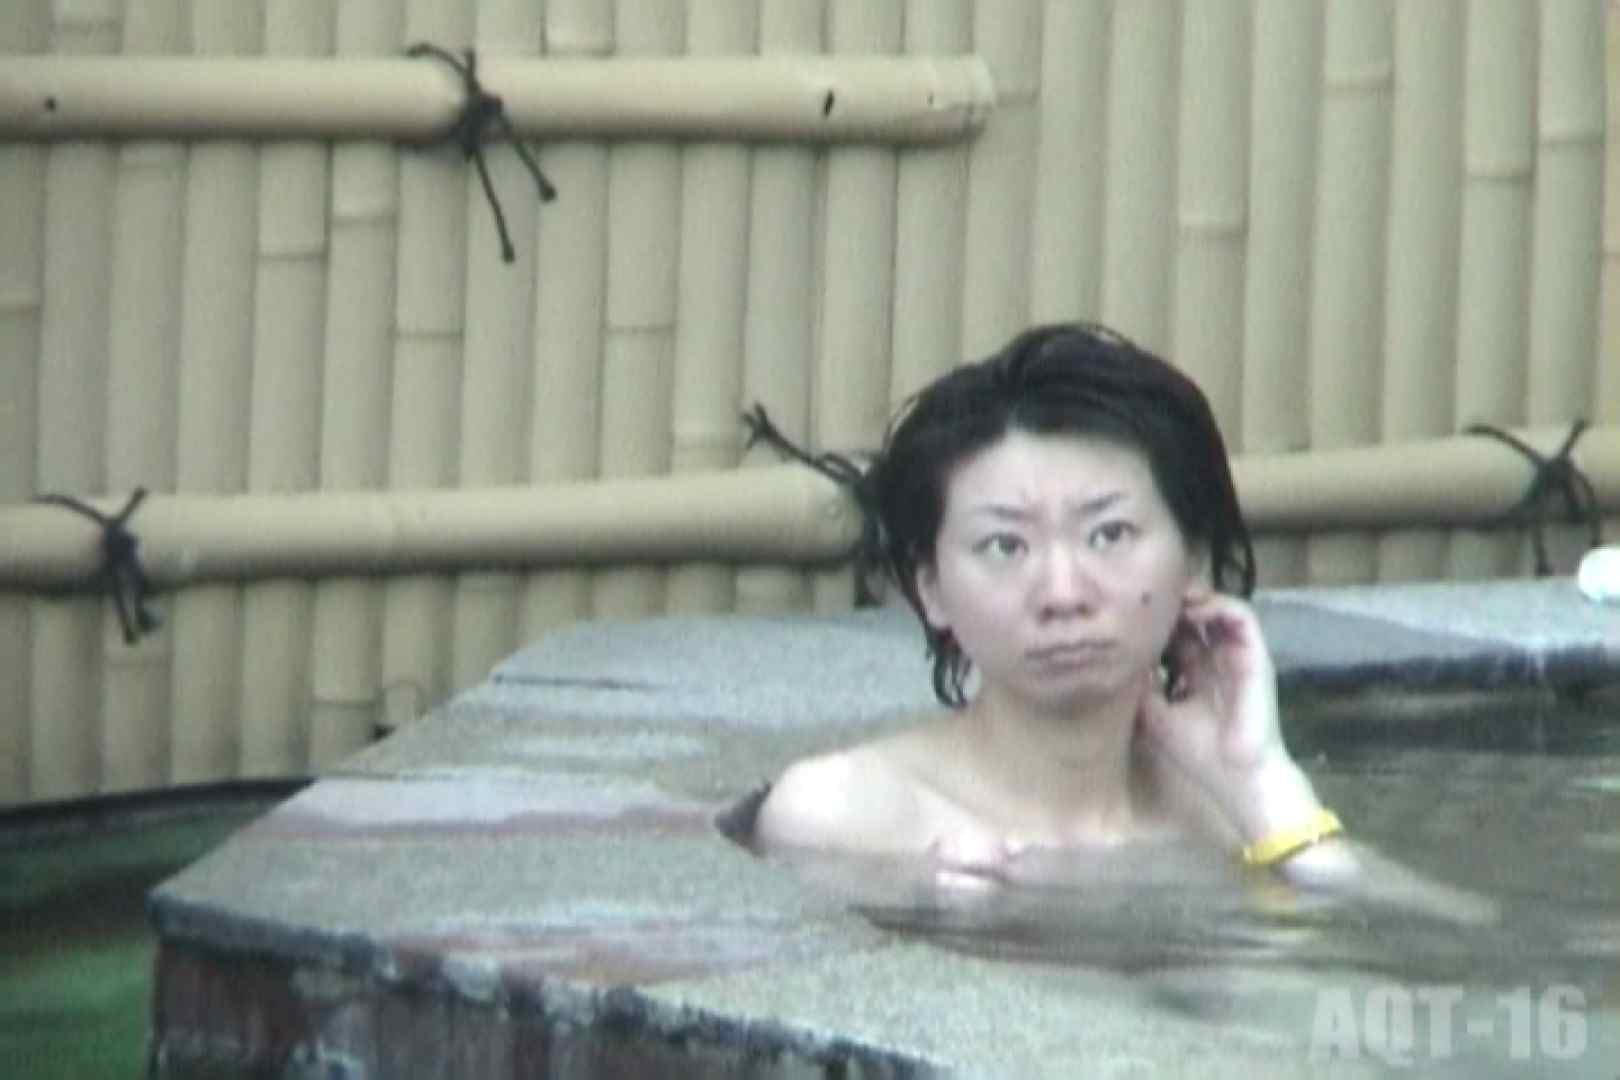 Aquaな露天風呂Vol.842 露天風呂編  82PIX 26